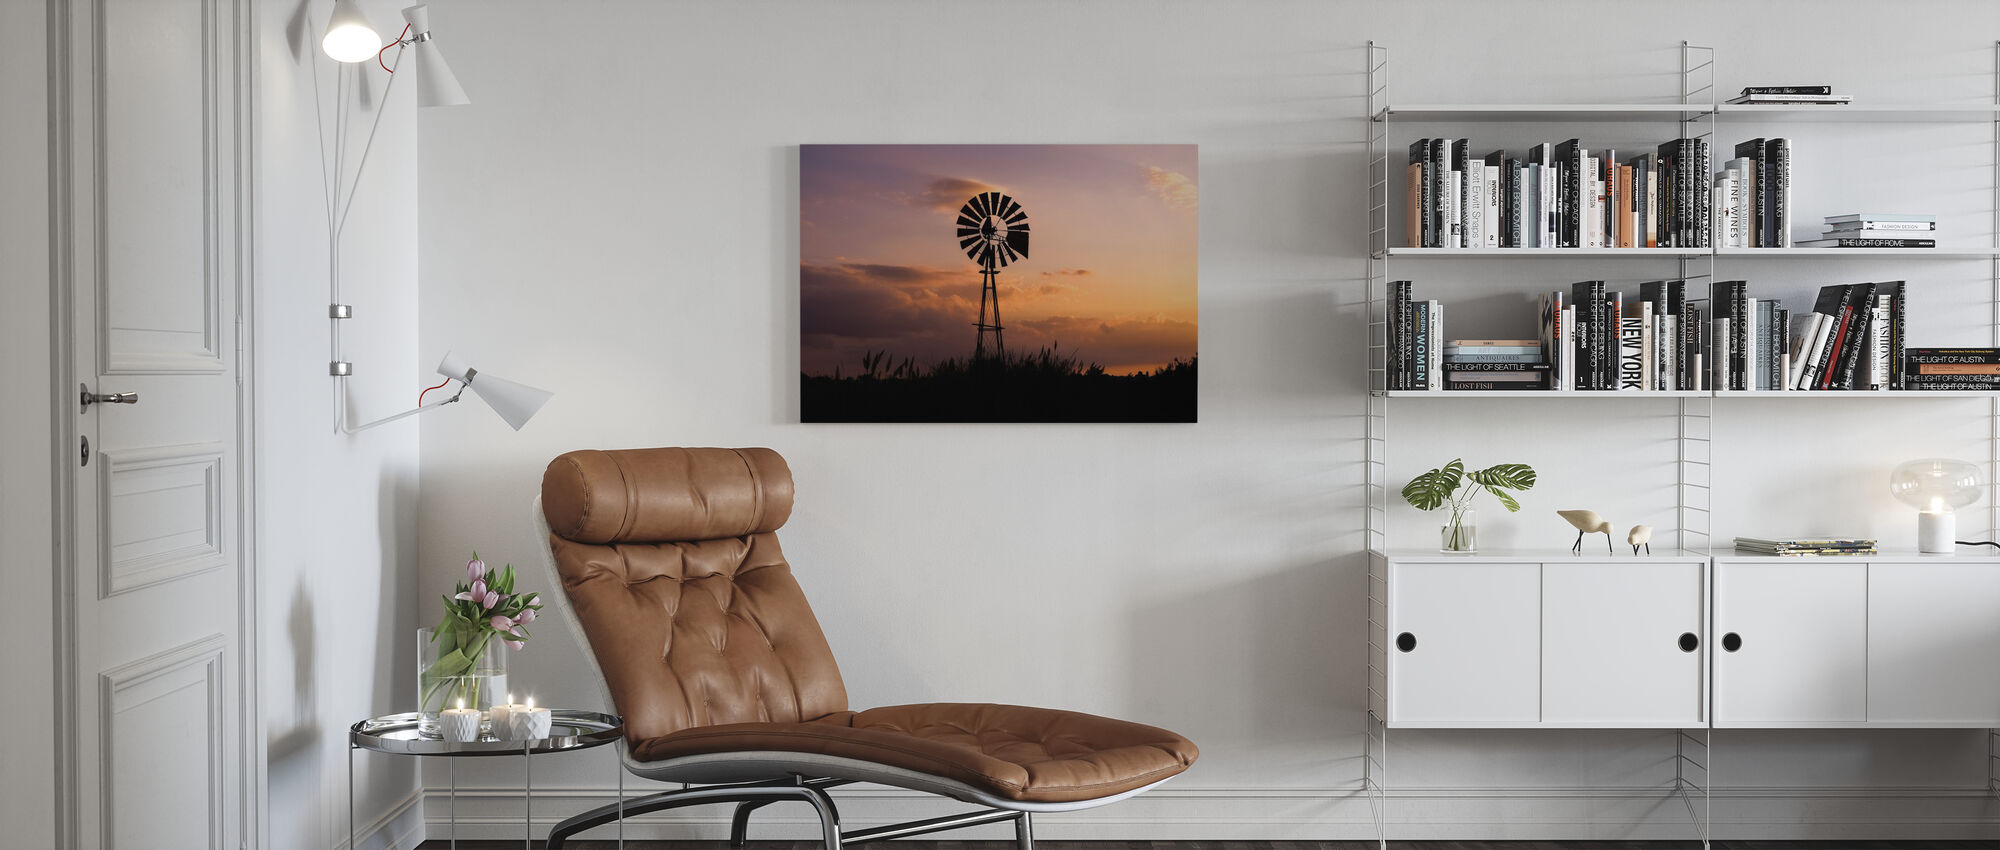 Windmill Sunset - Canvas print - Living Room